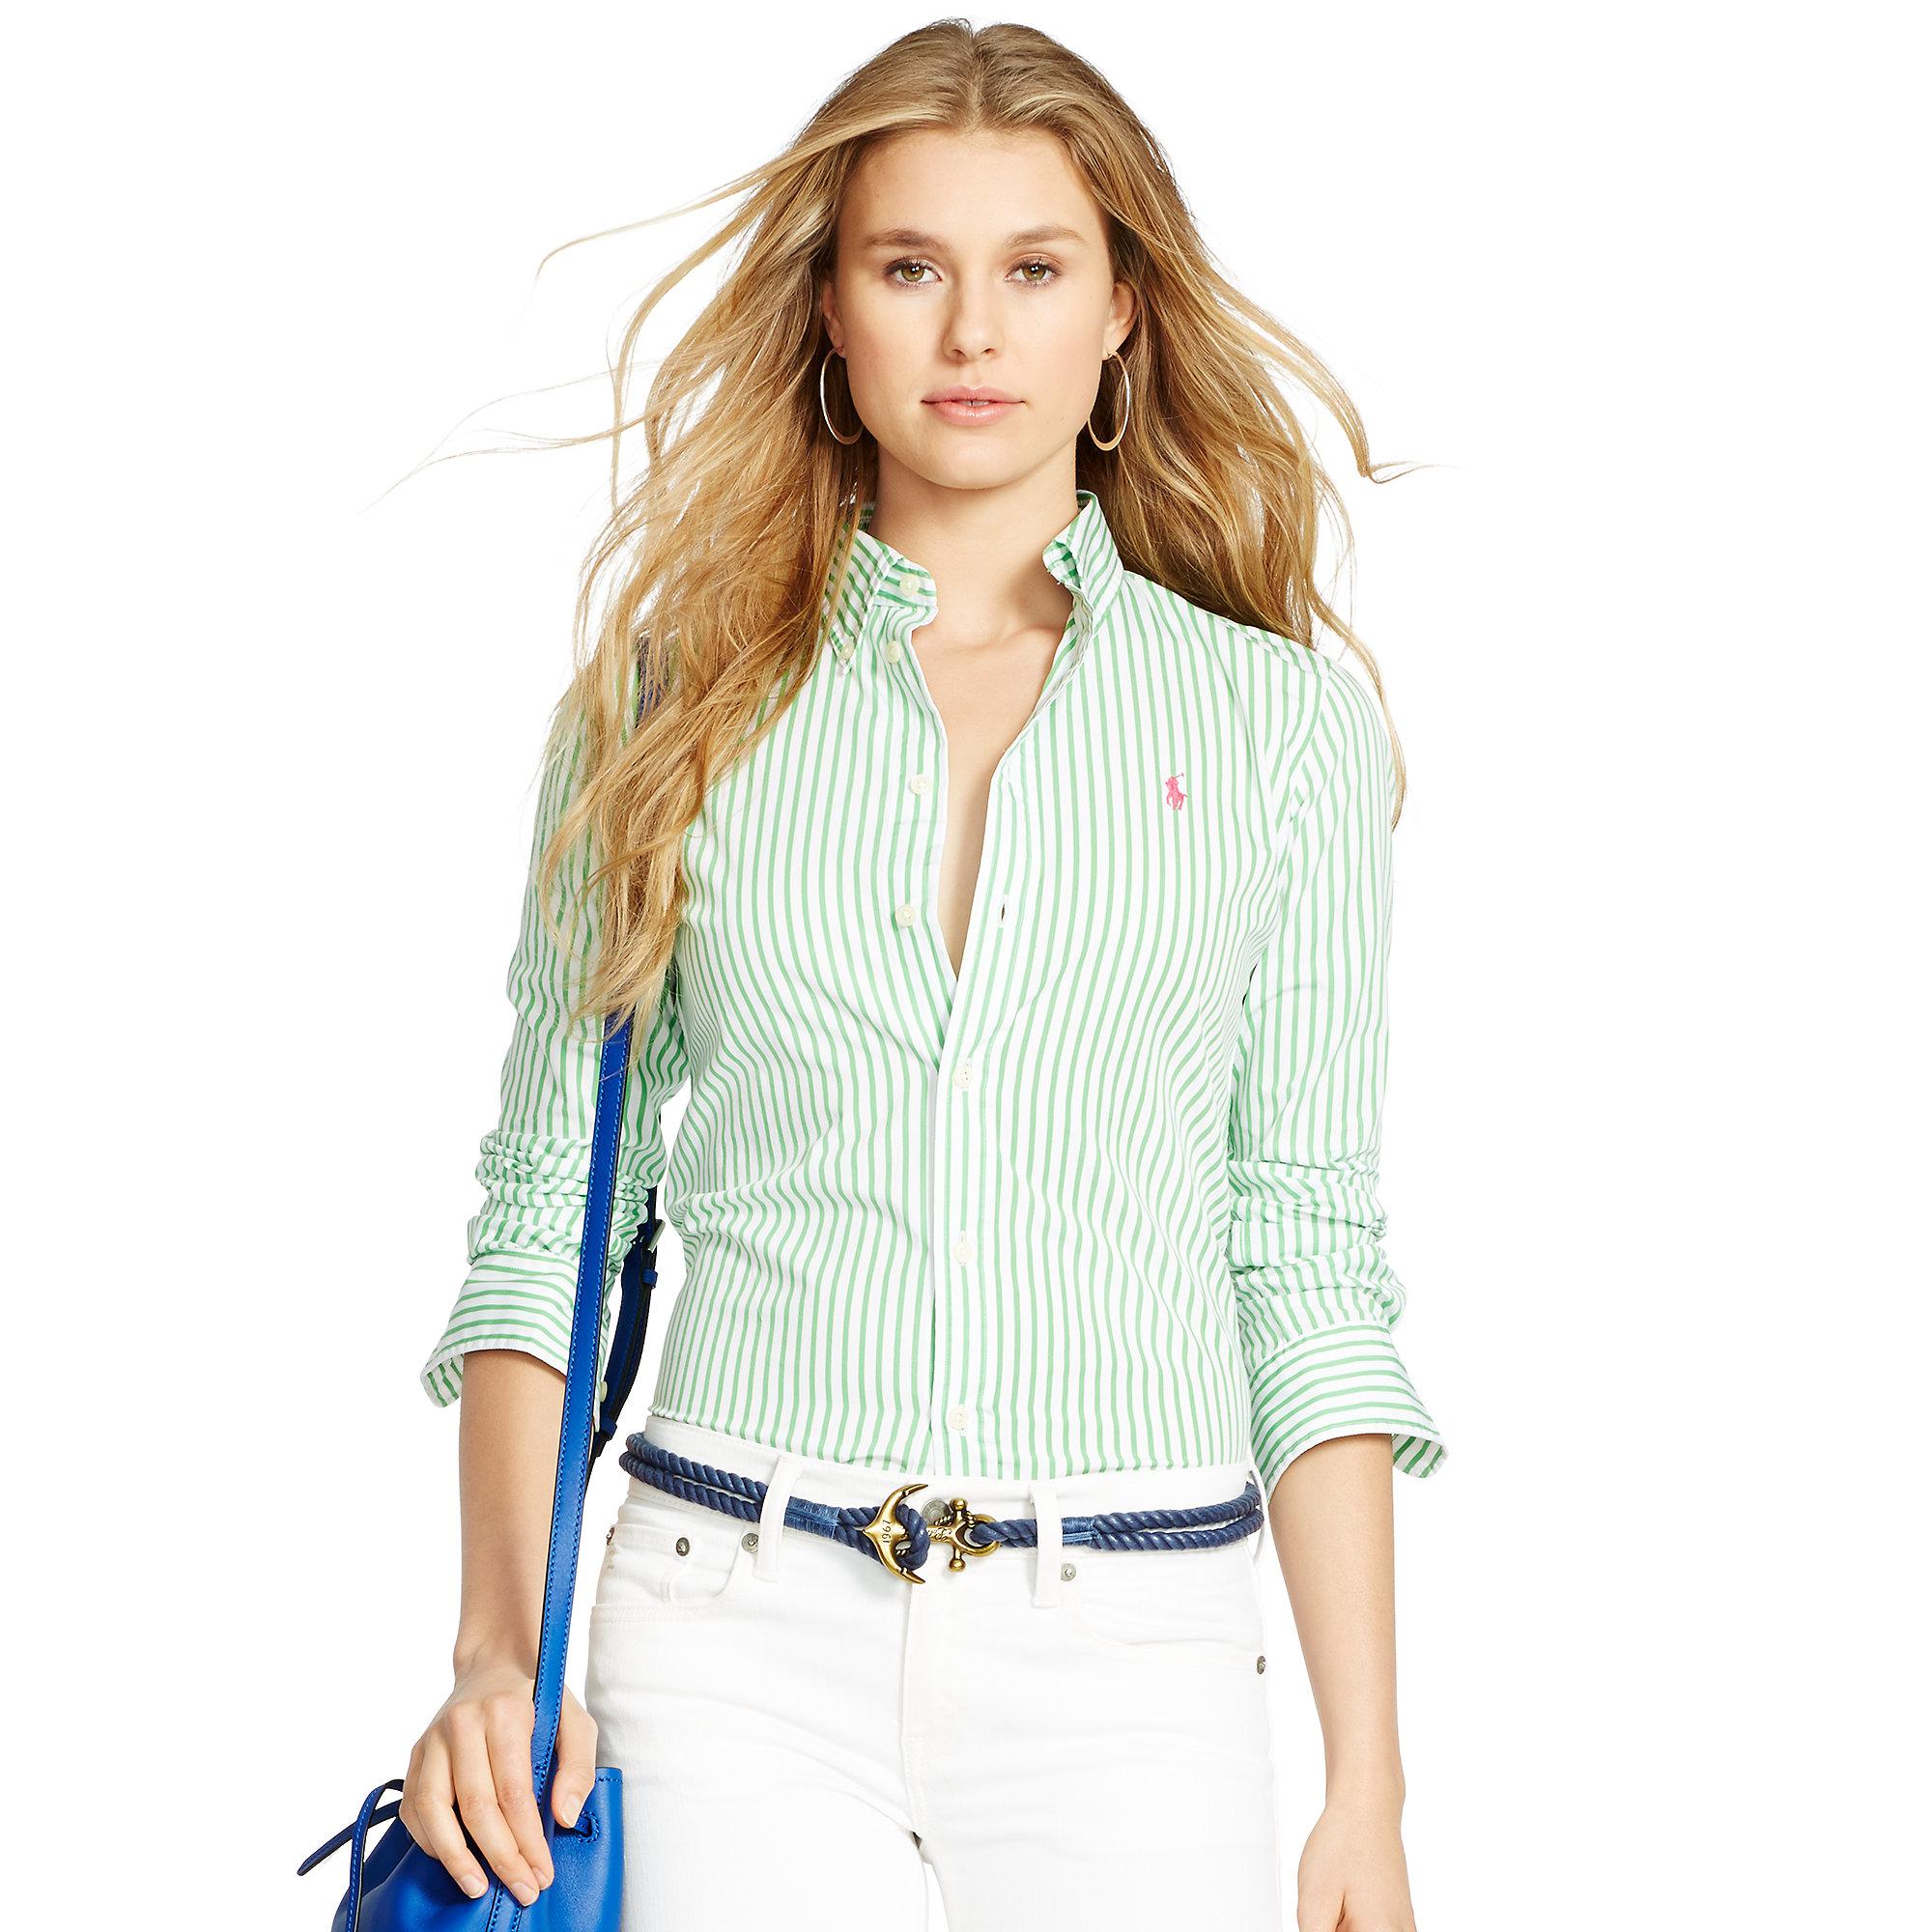 8cc6b717c43600 Polo Ralph Lauren Custom-fit Striped Shirt in Green - Lyst